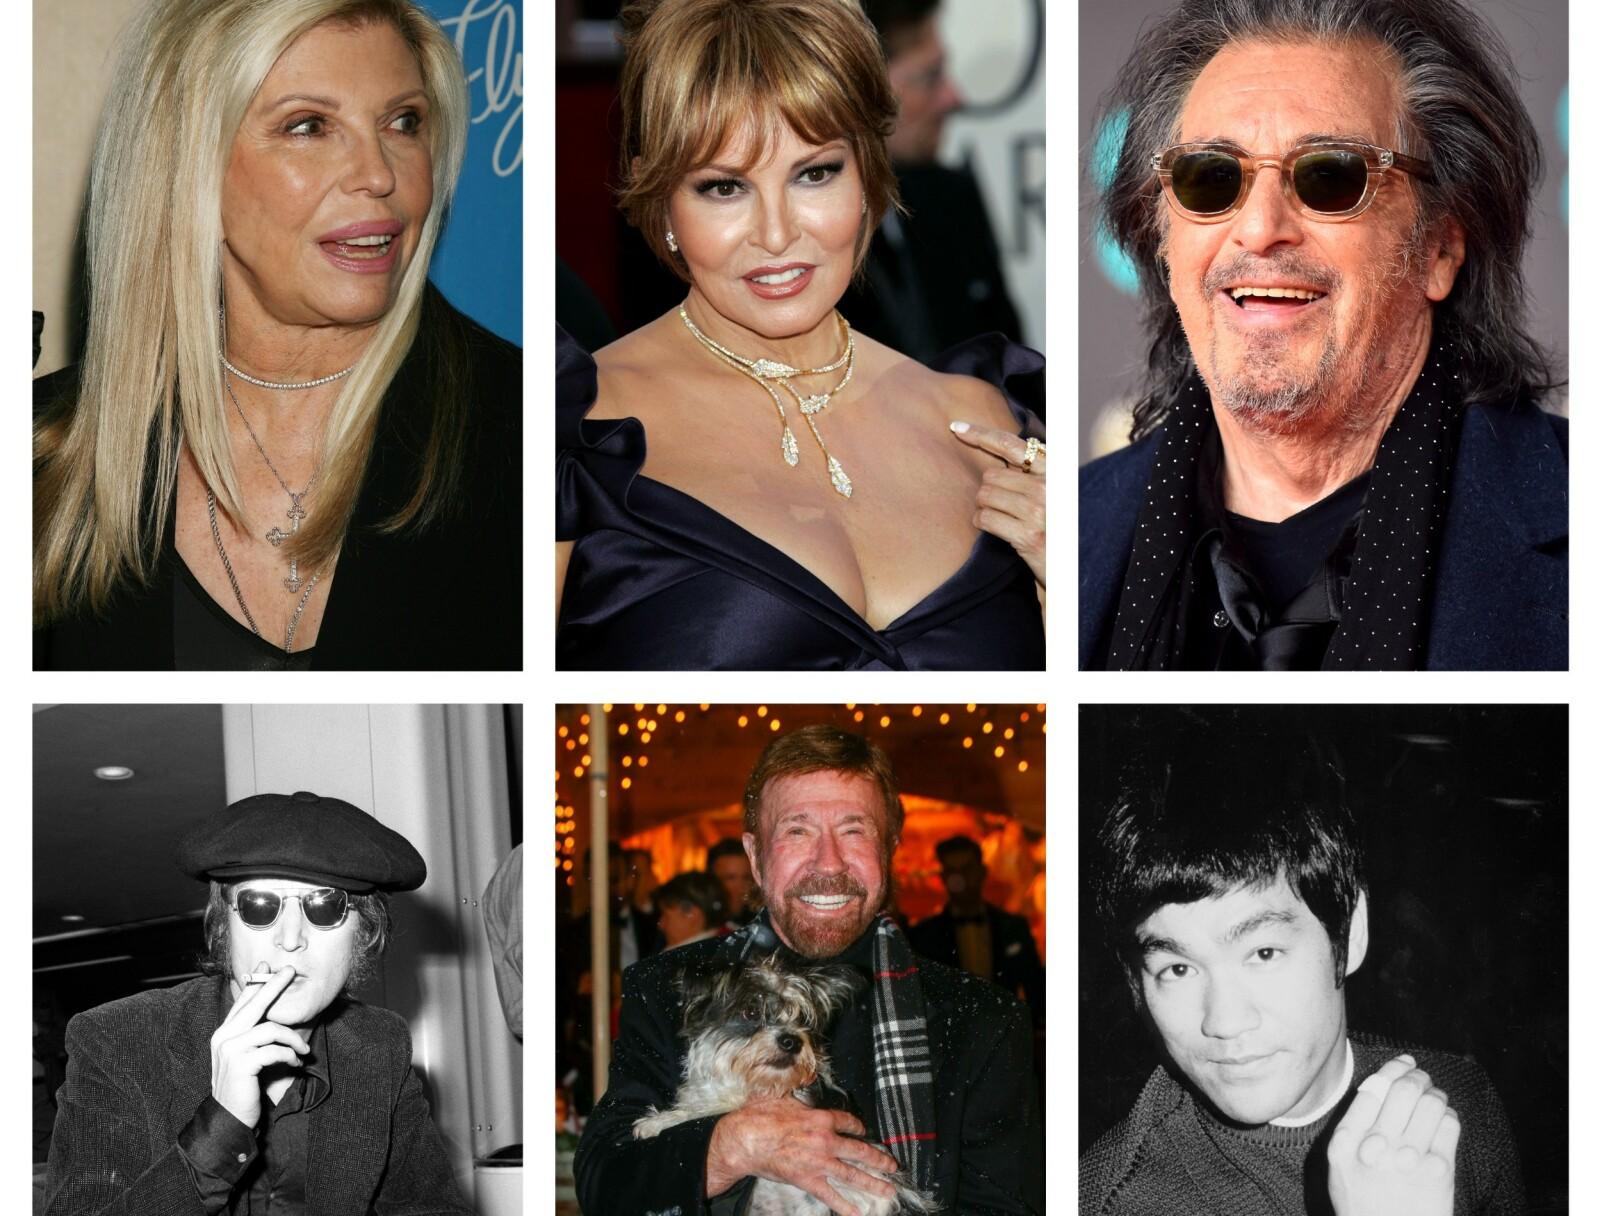 Øverst fra venstre: Nancy Sinatra 8.juni, Raquel Welch 5.september, Al Pacino 25.april, John Lennon ville ha fylt 80 år 9.oktober om han fortsatt levde, Chuck Norris, 10.mars og Bruce Lee, 37.november. Foto: NTB Scanpix